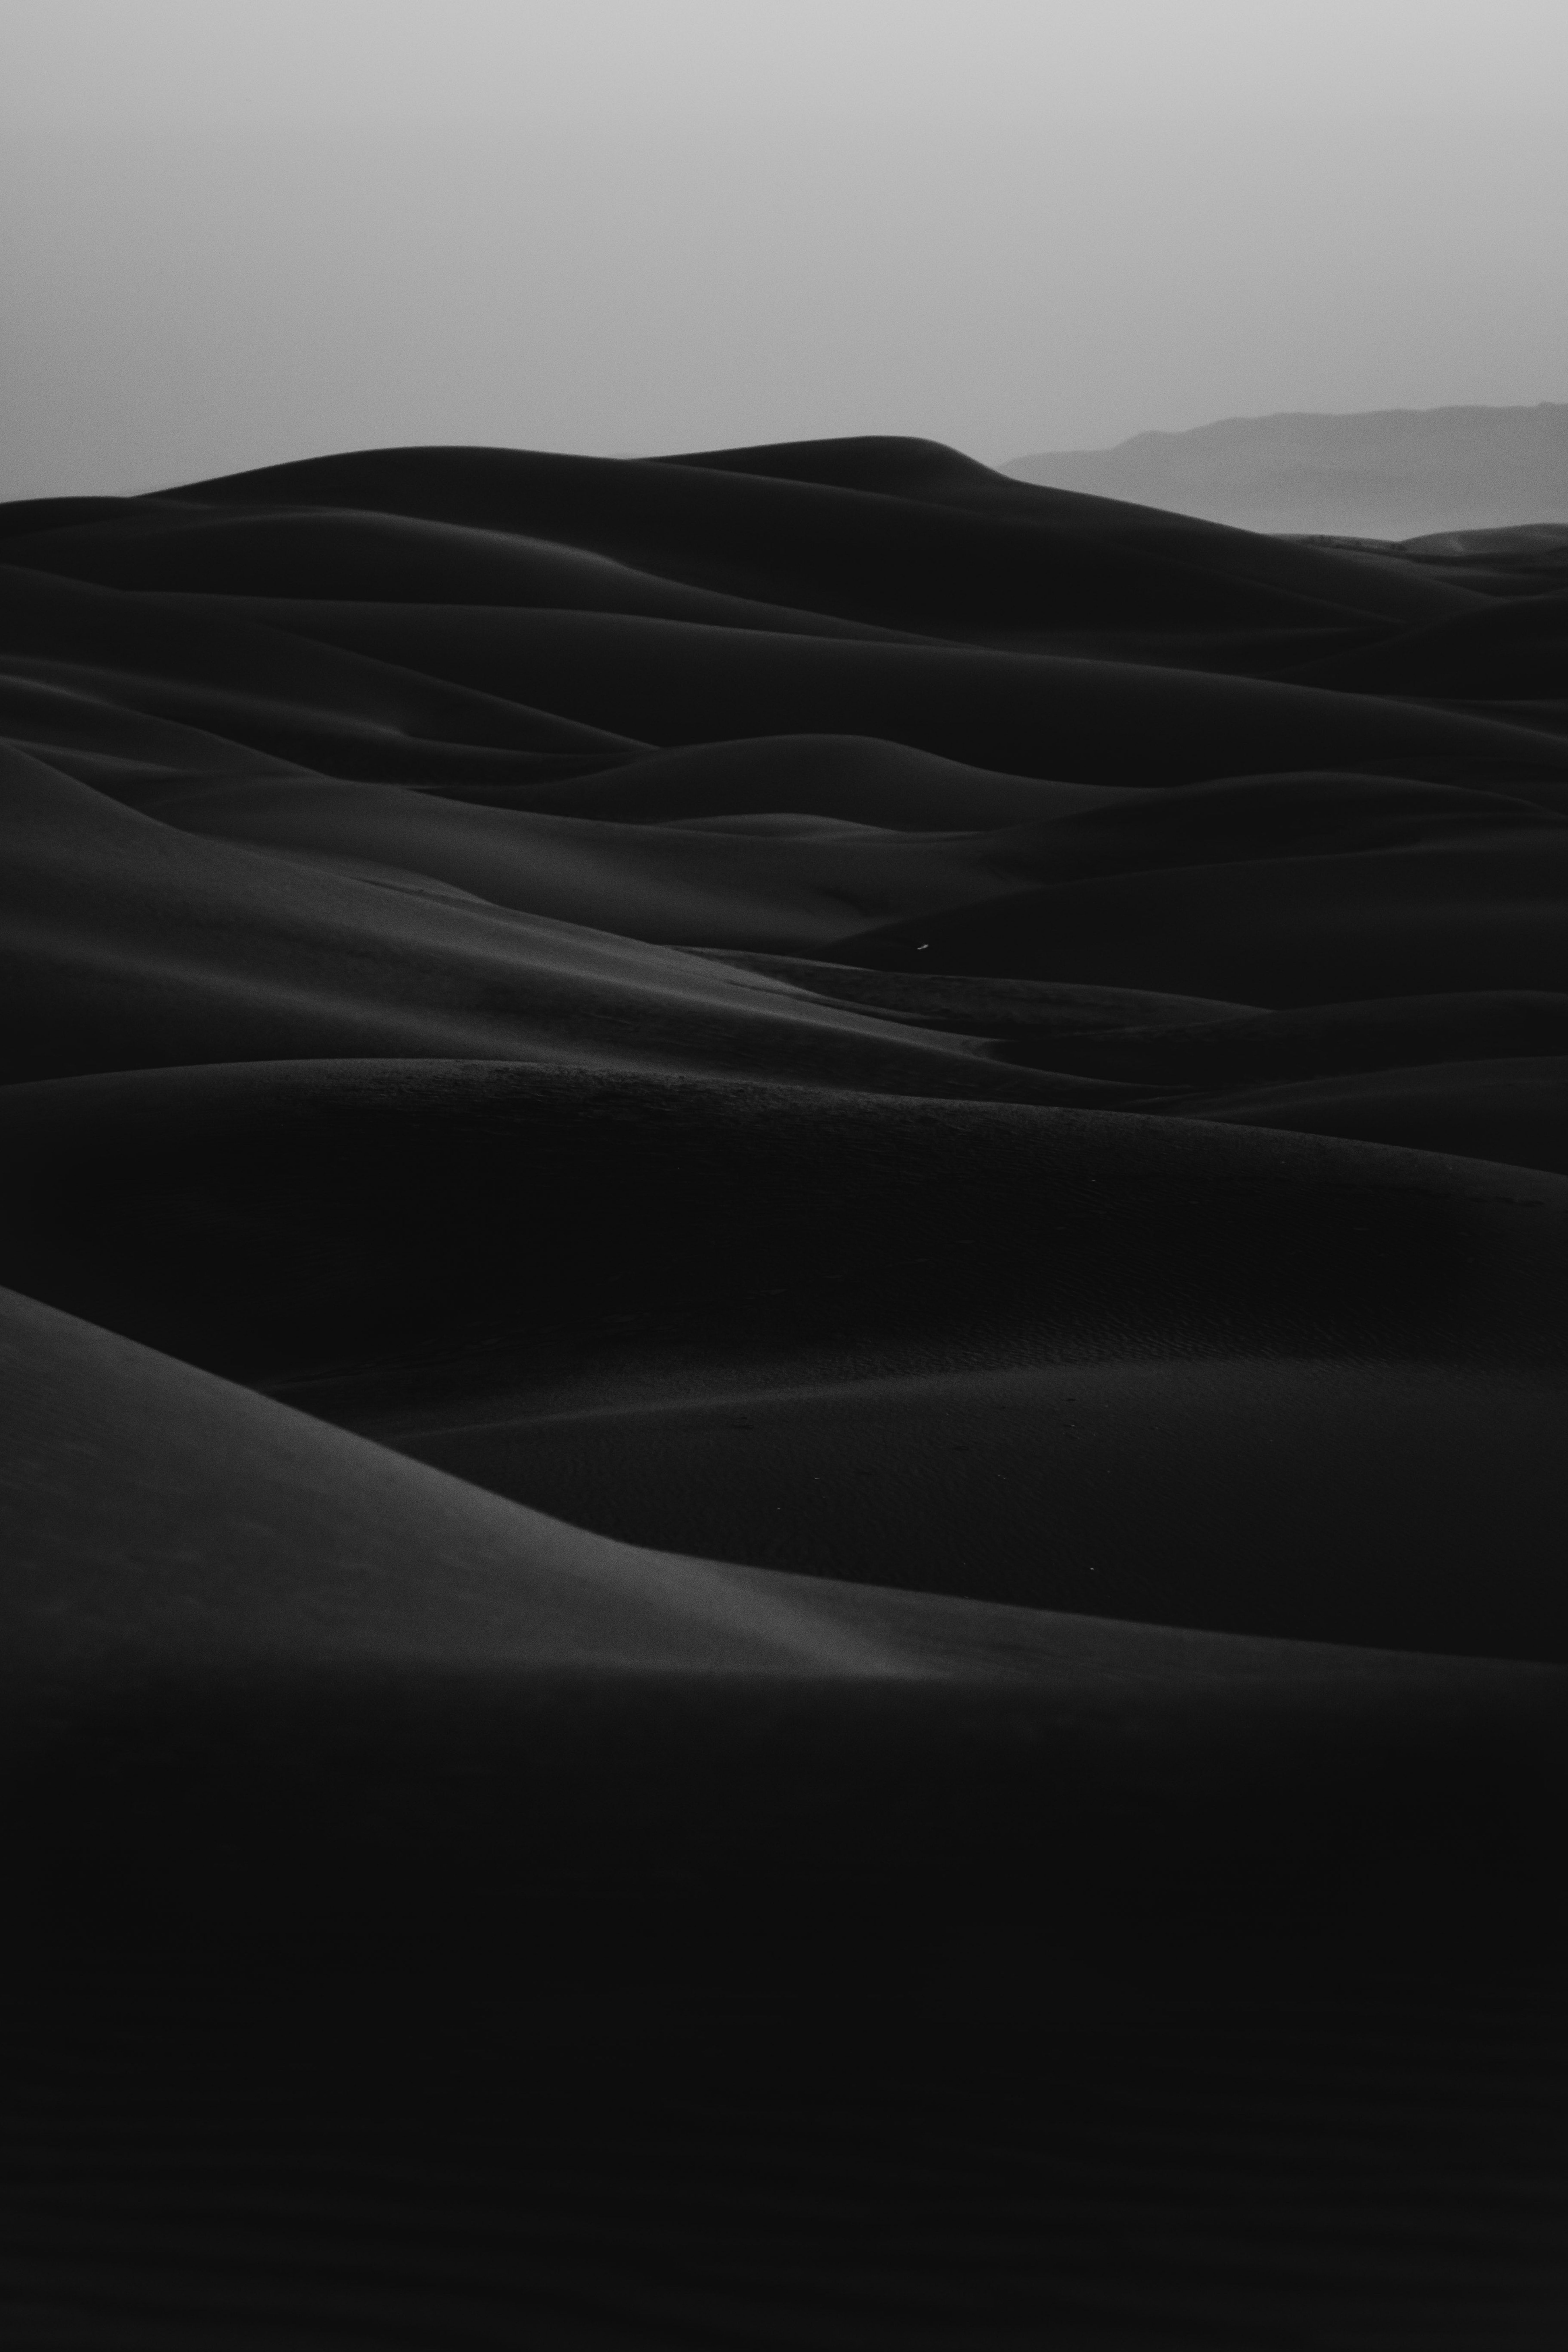 Landscape, hill, sand and desert HD photo by Jeremy Bishop ...